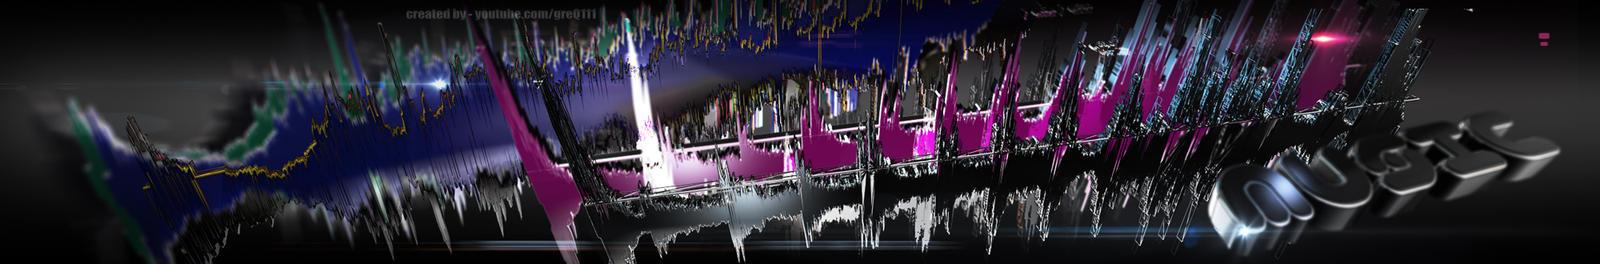 Electronic Music - Free Art by greQ111